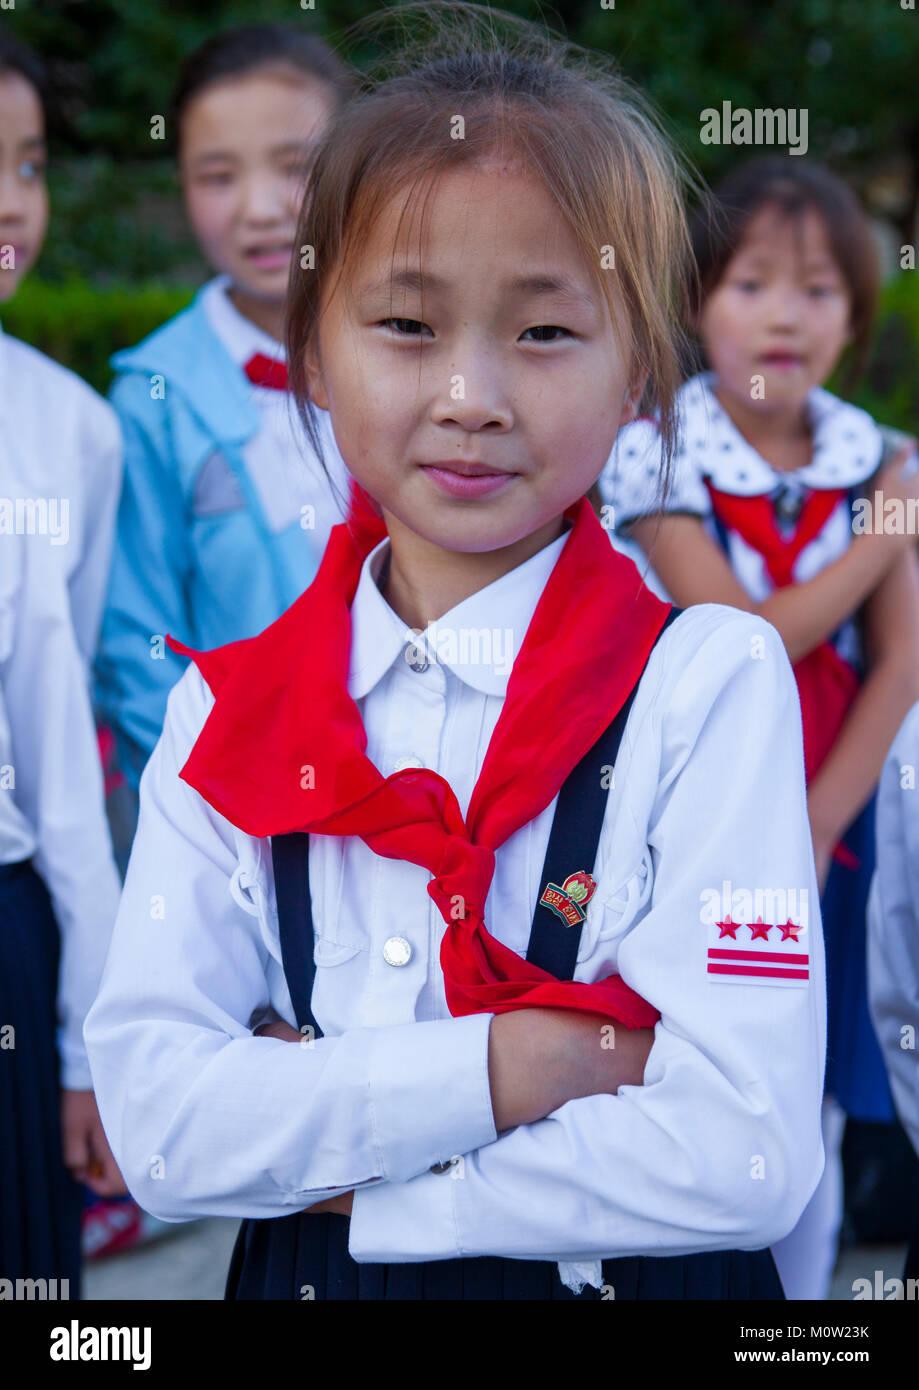 Pioneer girl in Songdowon international children's camp, Kangwon Province, Wonsan, North Korea - Stock Image